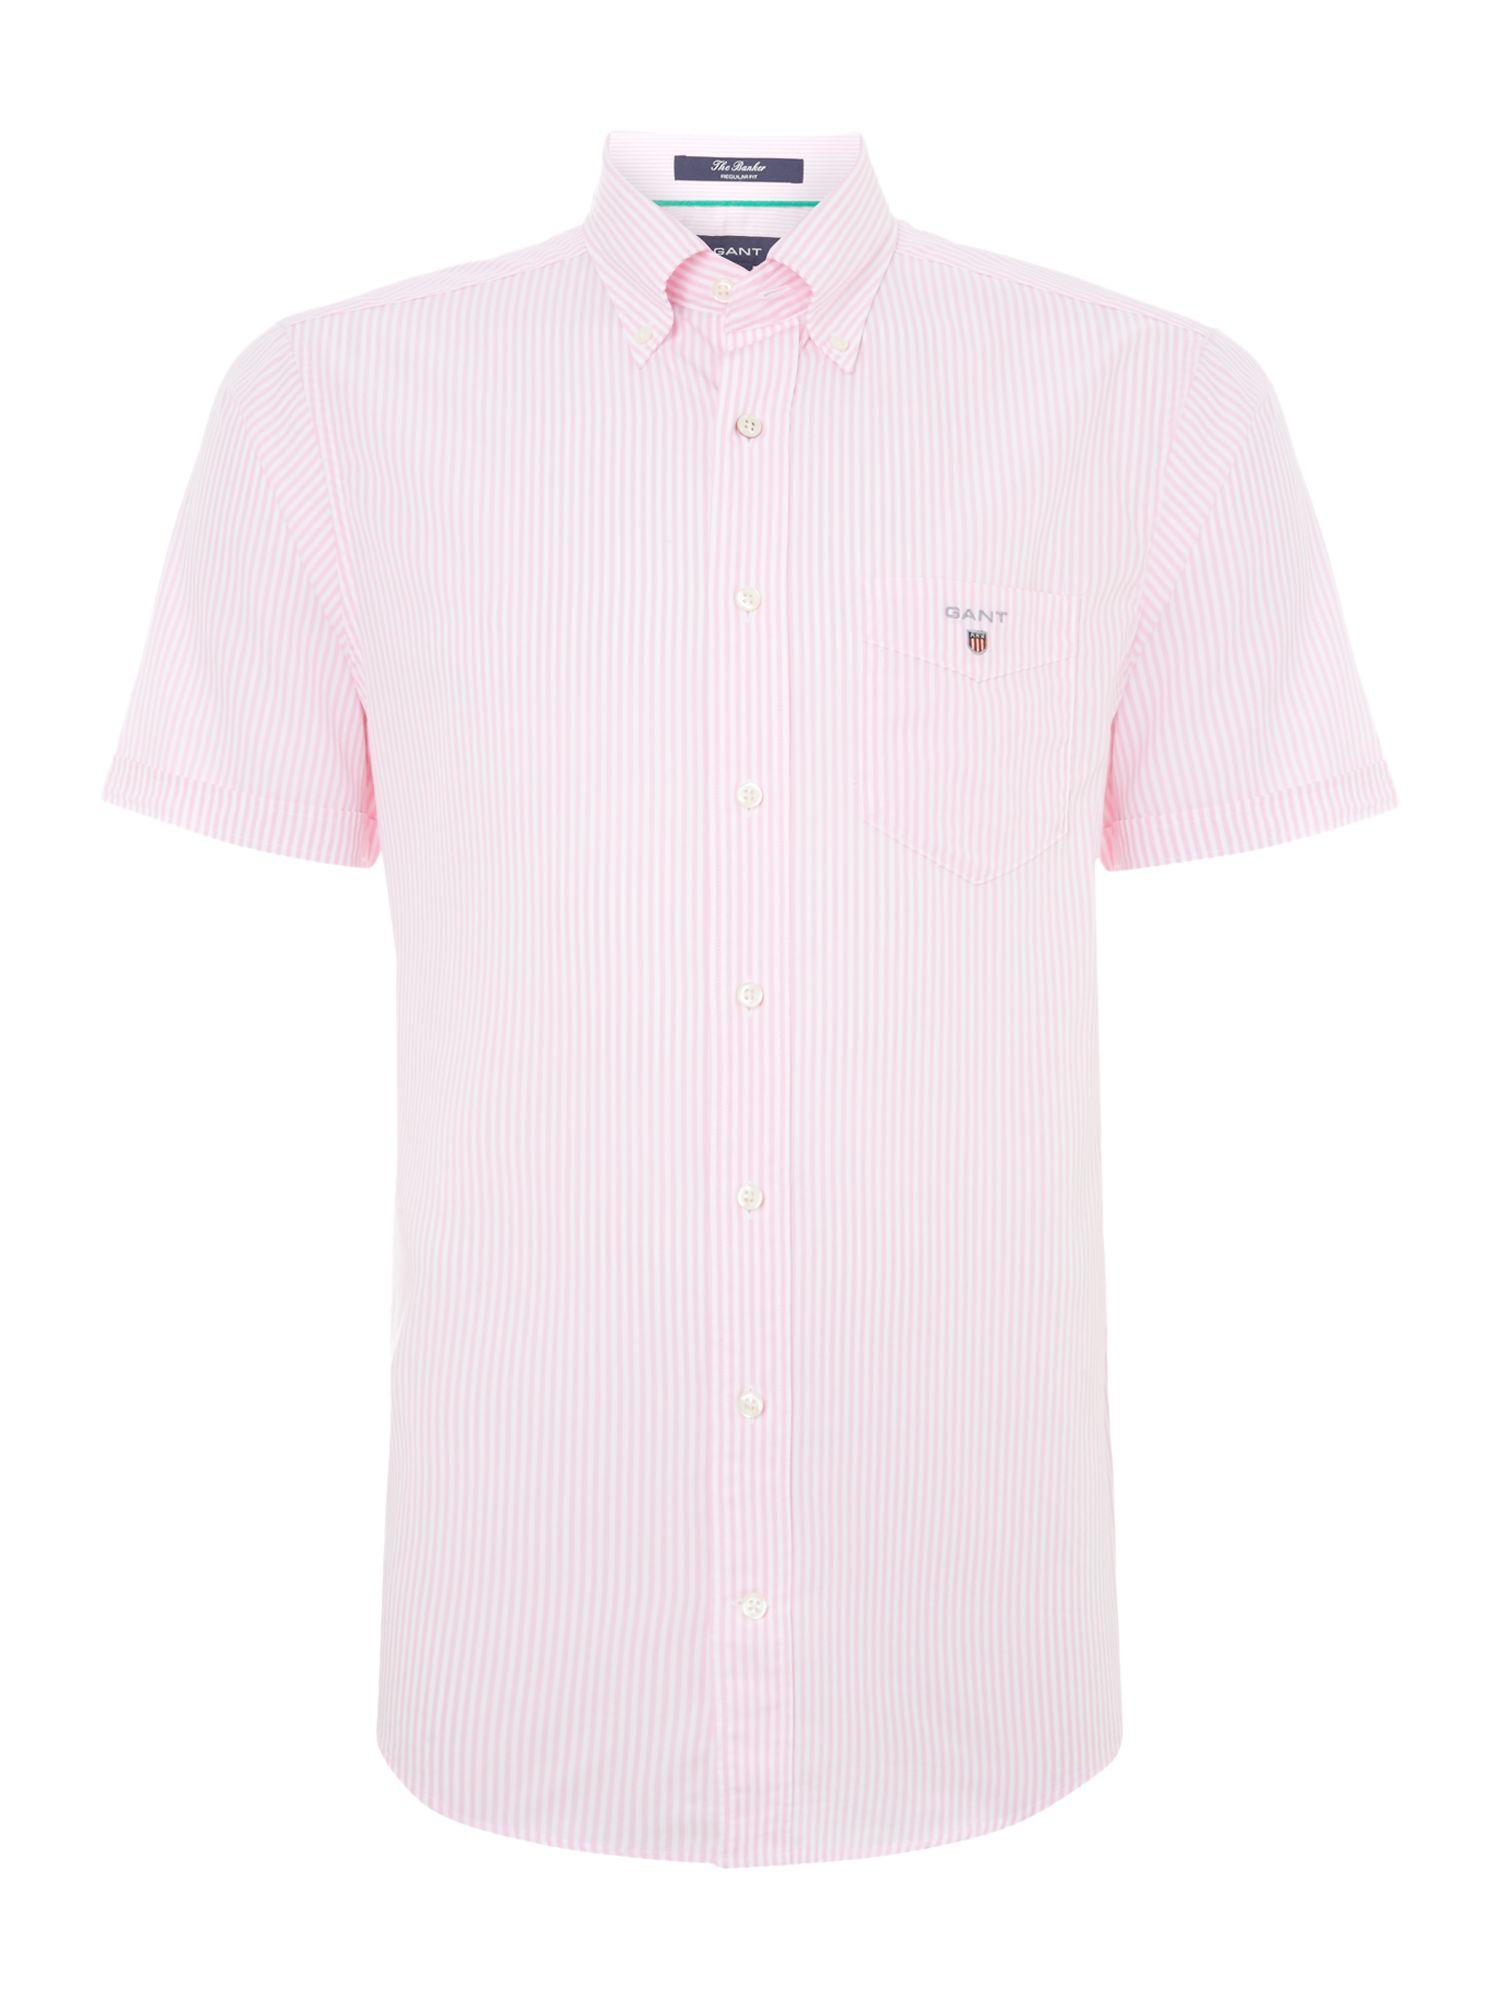 Gant Short Sleeve Banker Shirt In Pink For Men Lyst